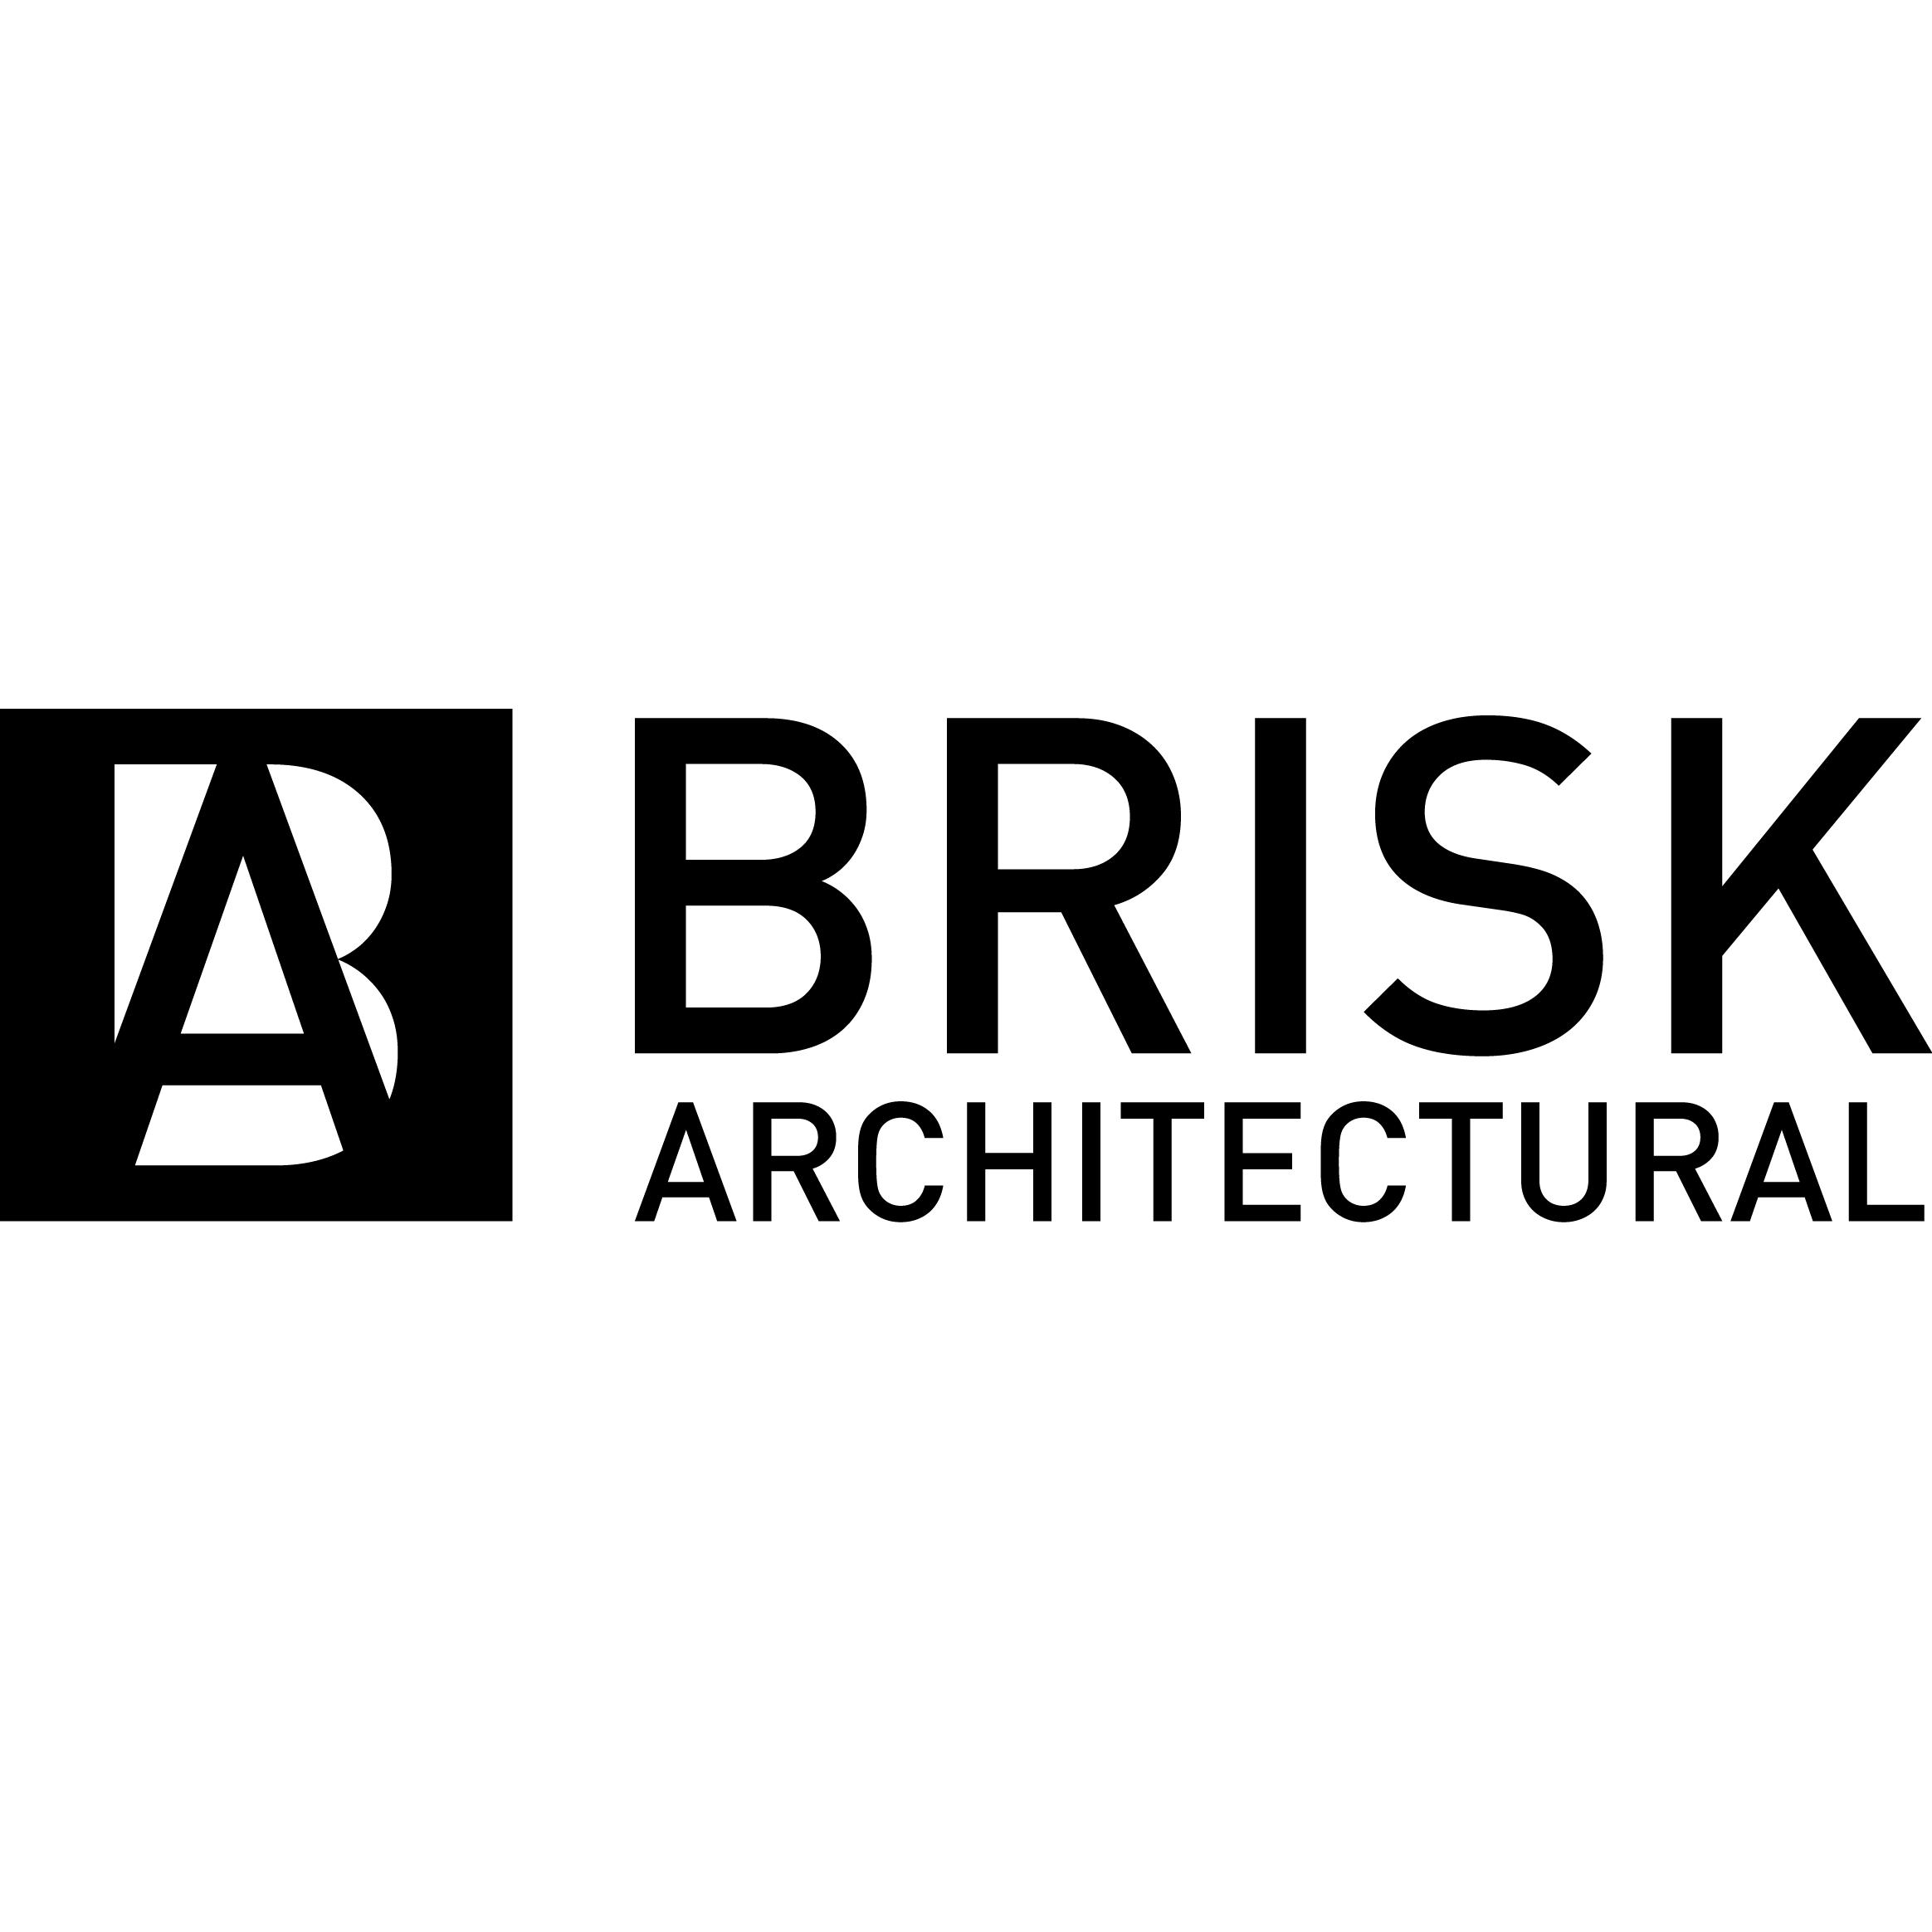 Brisk Architectural